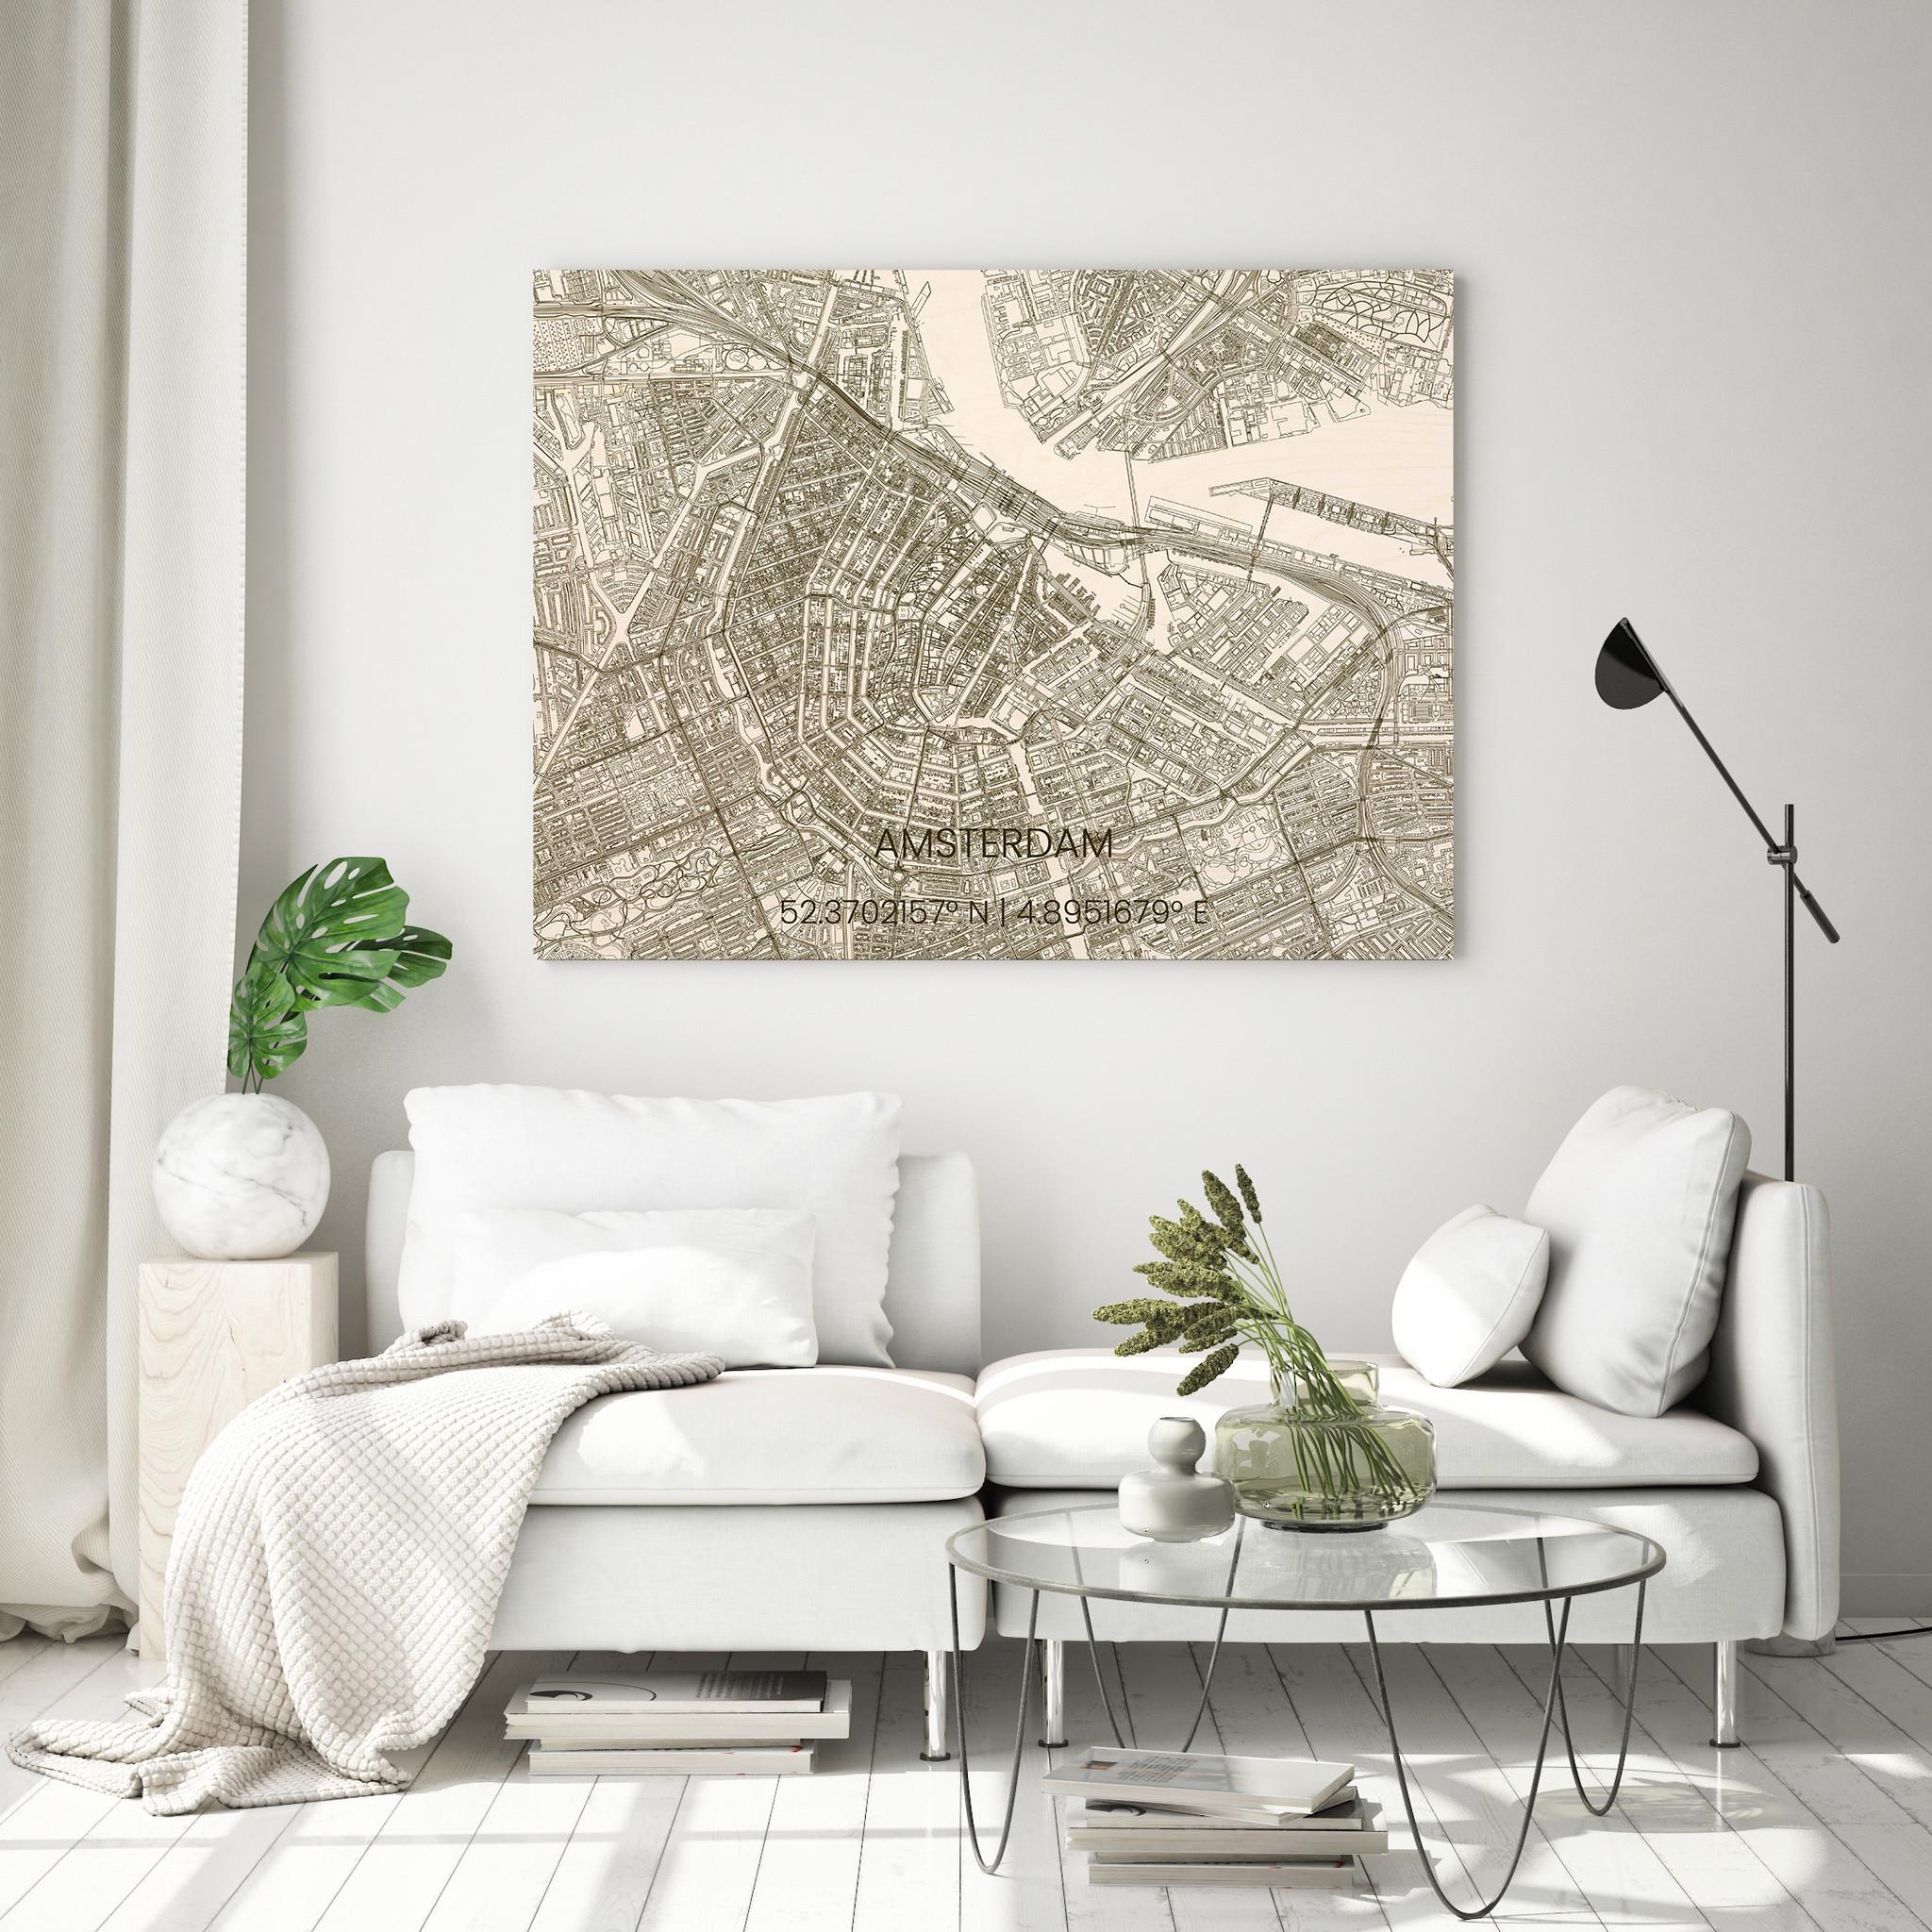 Wooden wall decoration citymap Amsterdam-4